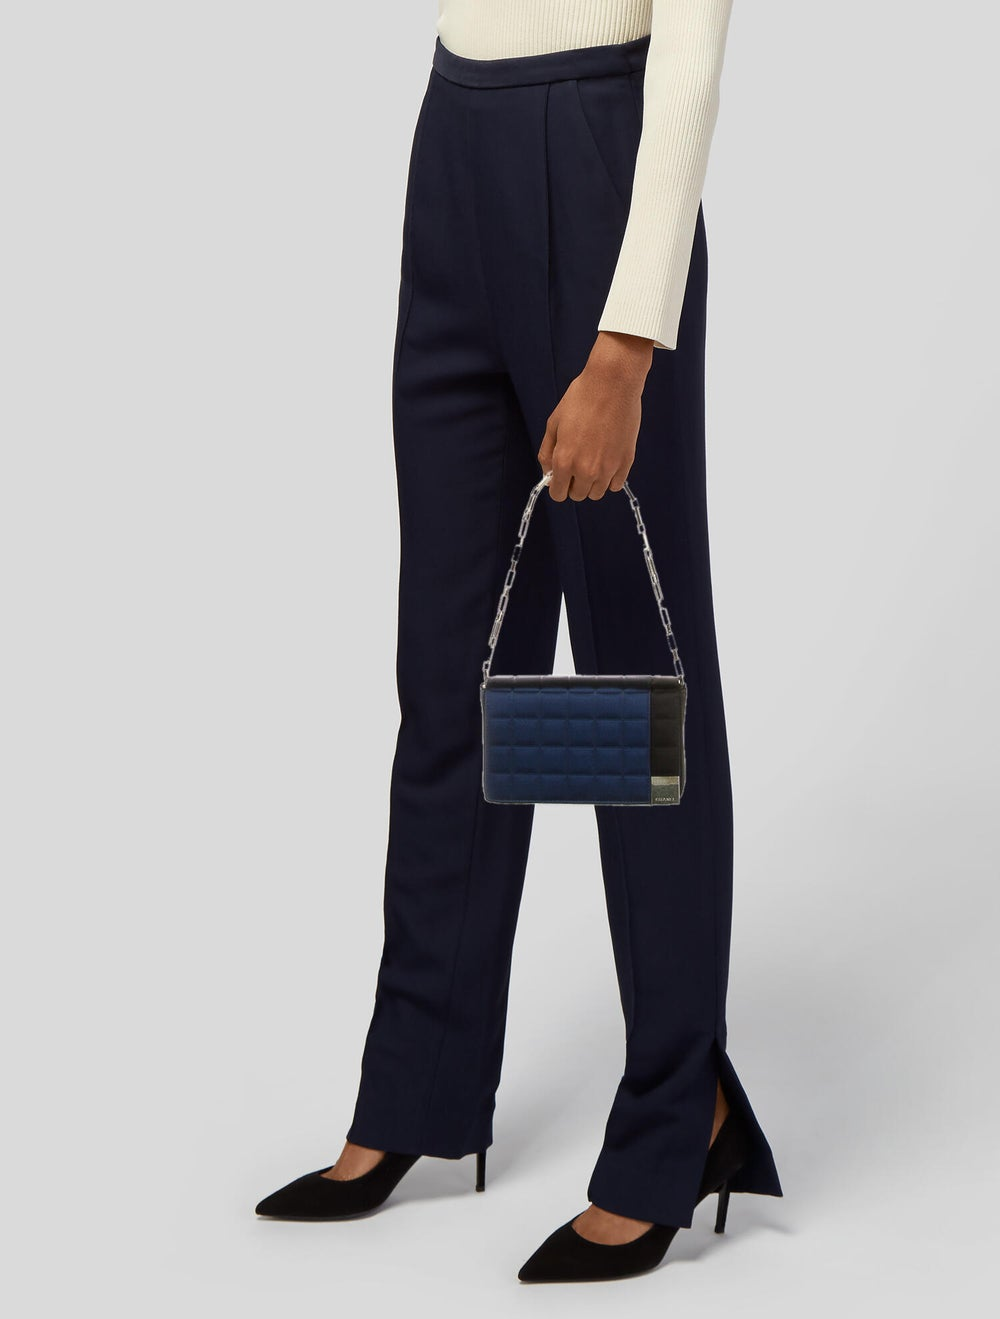 Chanel Satin Square Quilt Flap Bag Blue - image 2